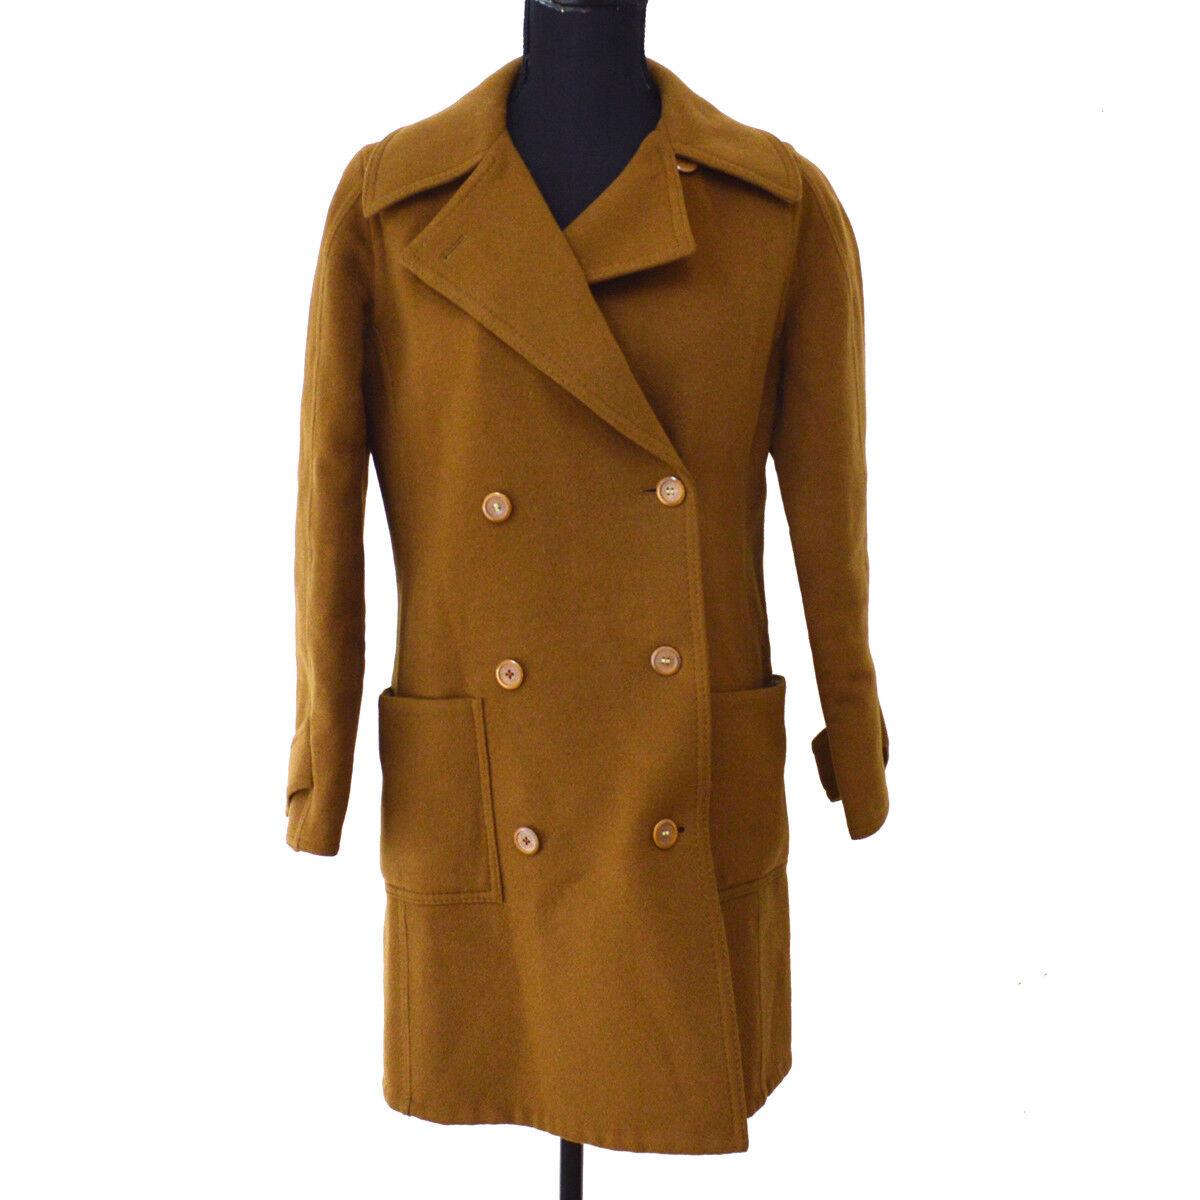 Authentic HERMES Vintage Logos Long Sleeve Coat Jacket braun S08019k